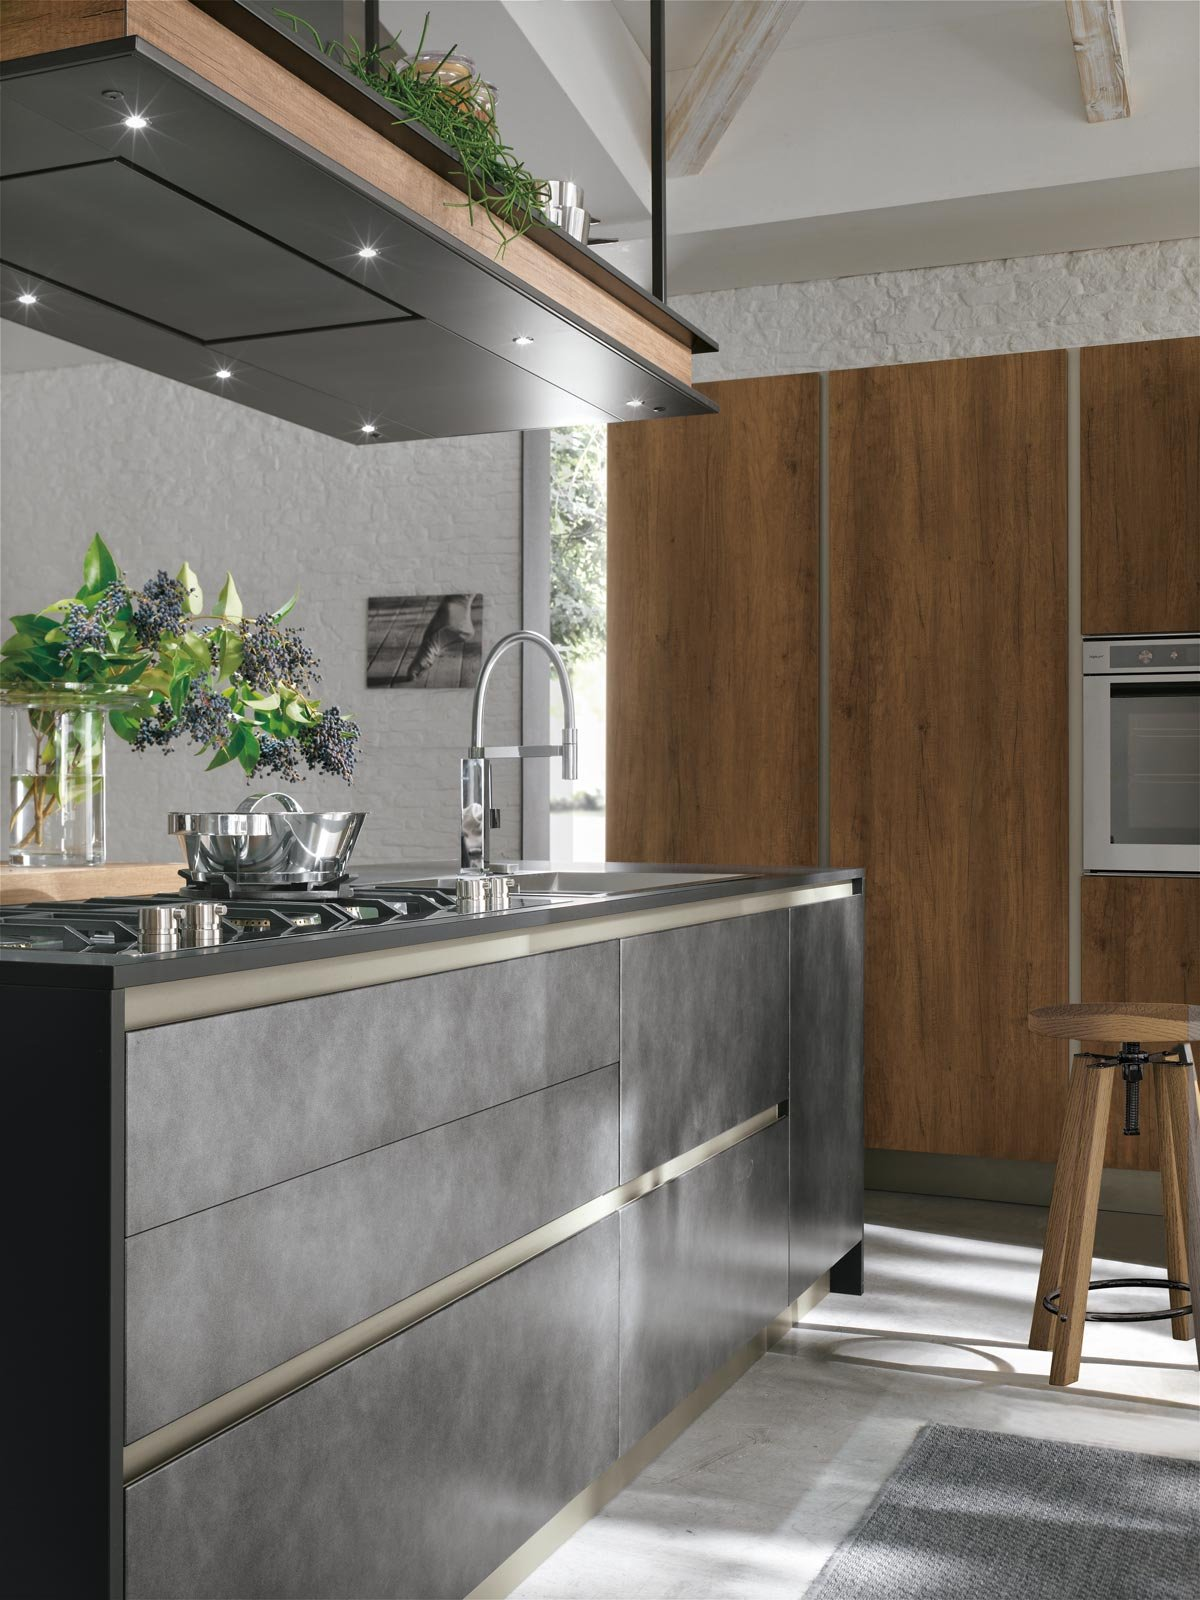 Beautiful Infinity Quanto Costa Gallery - Home Design - joygree.info